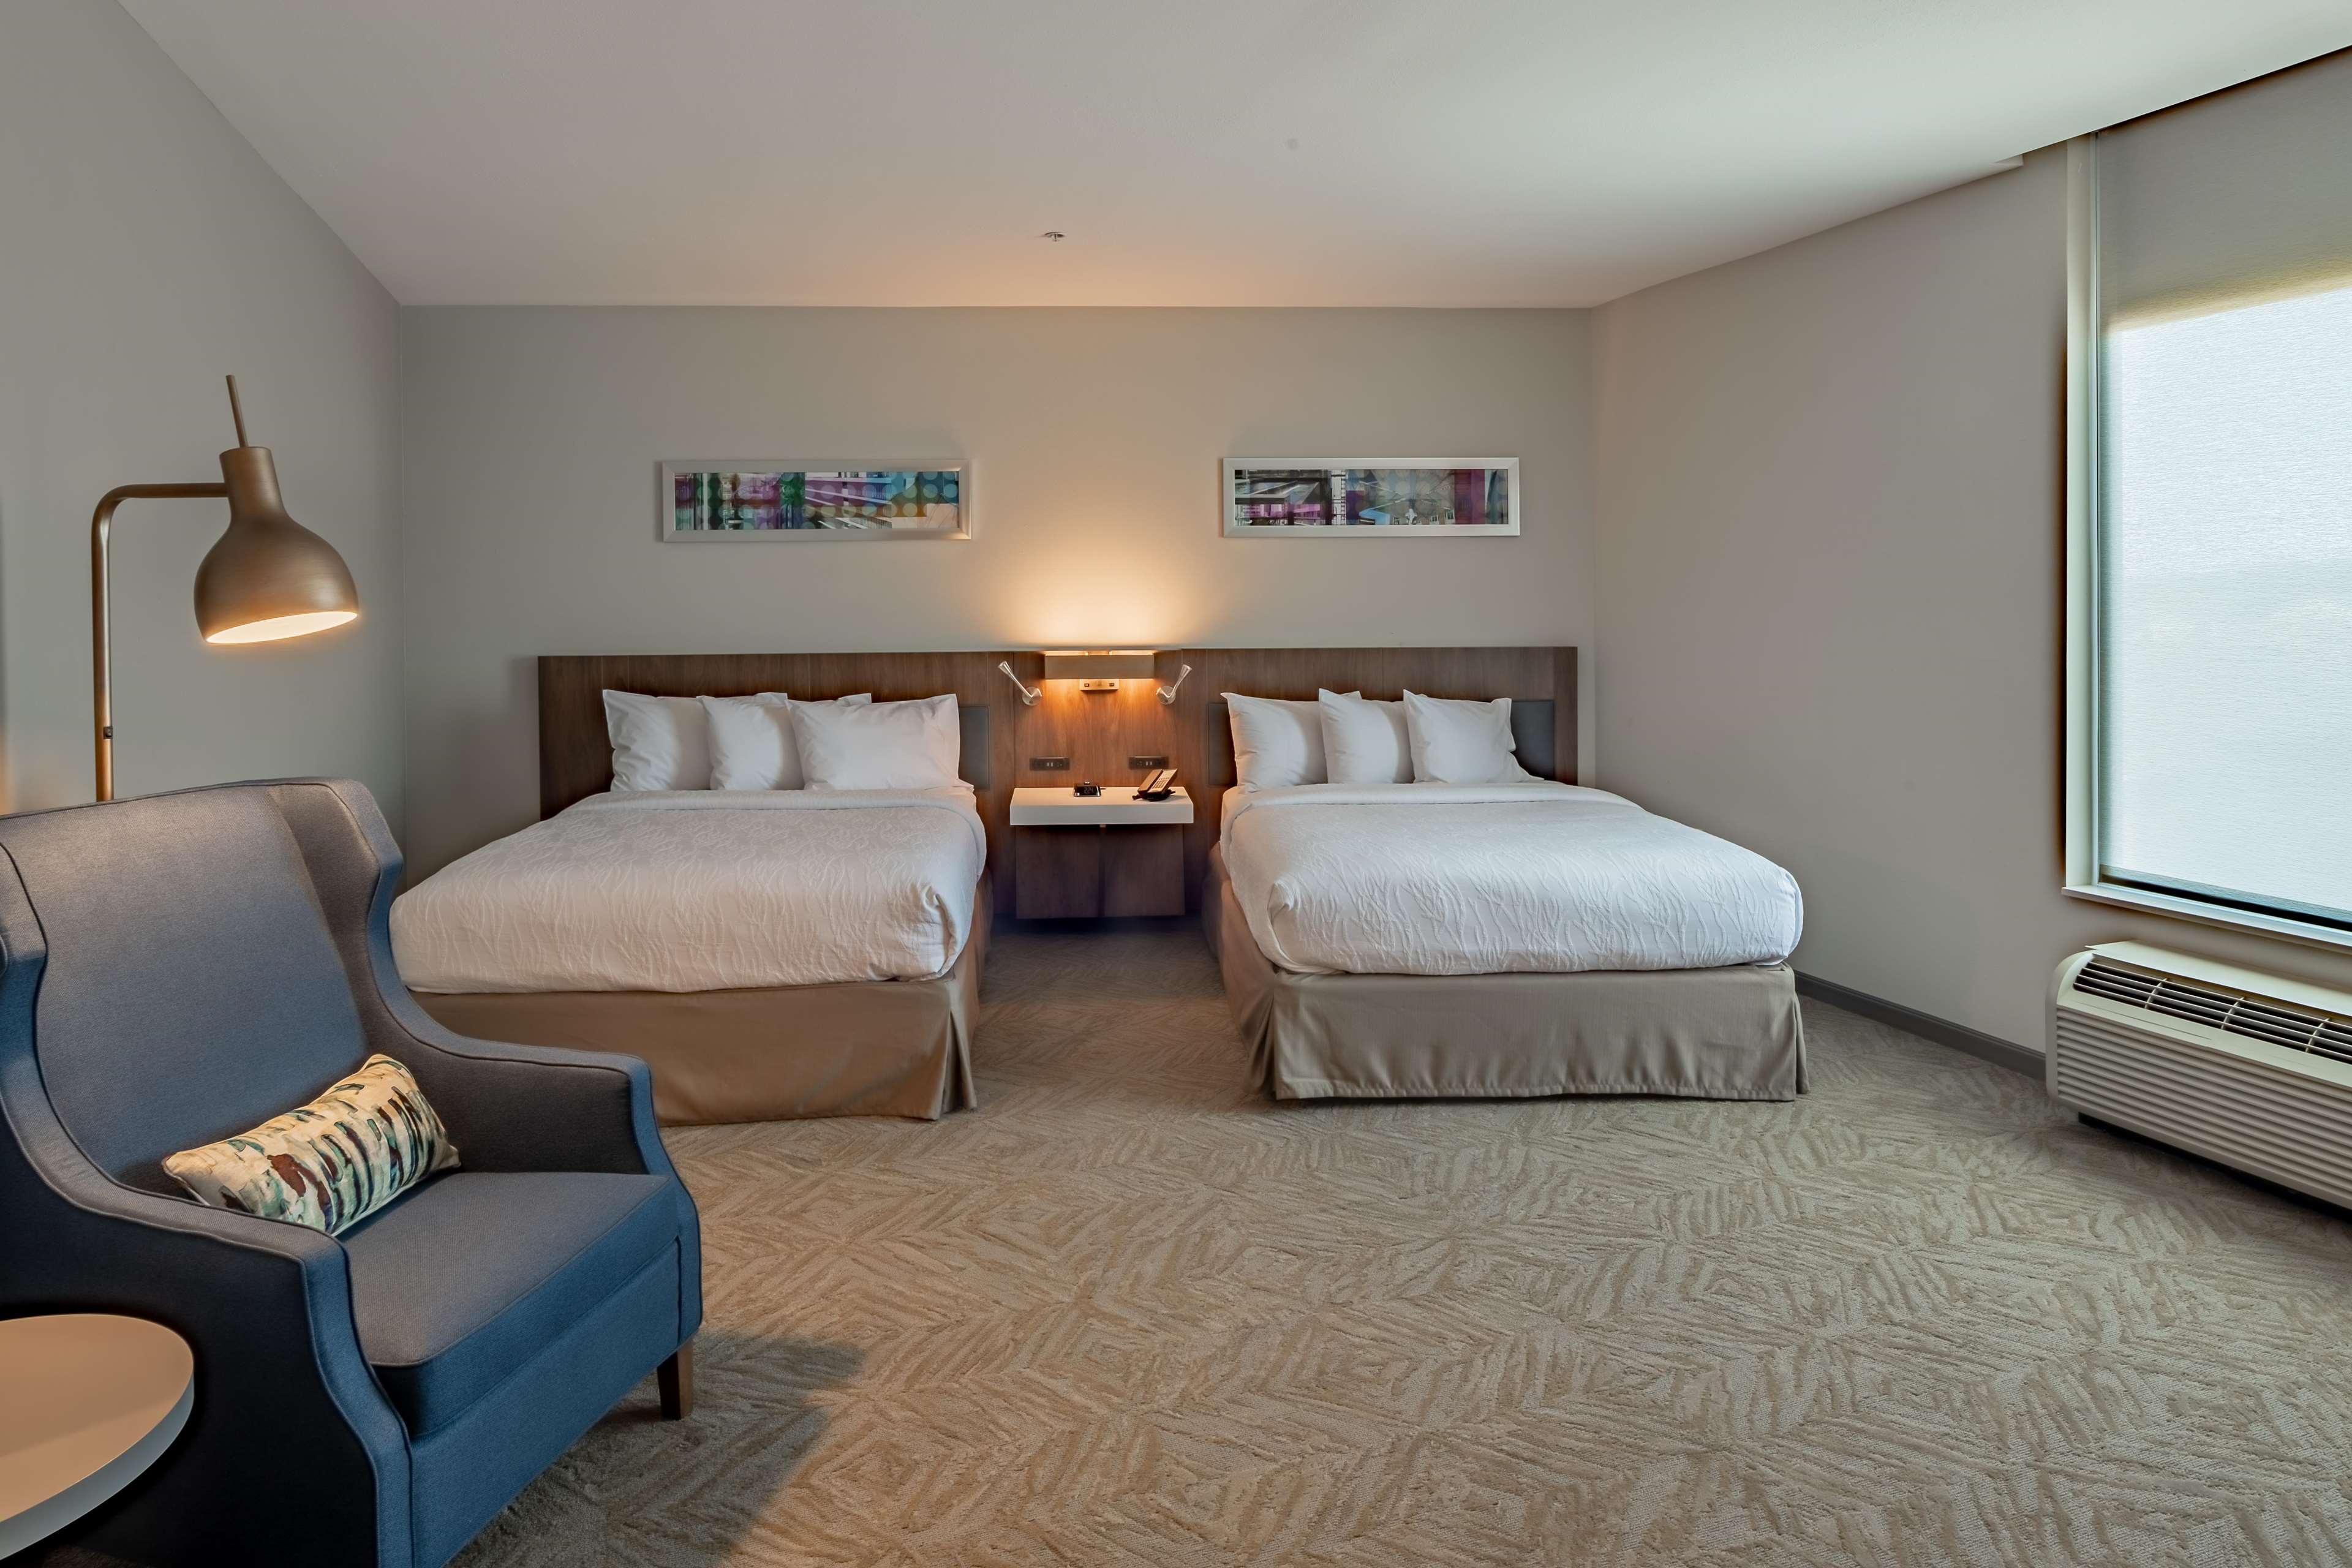 Hilton Garden Inn Dallas at Hurst Conference Center image 24